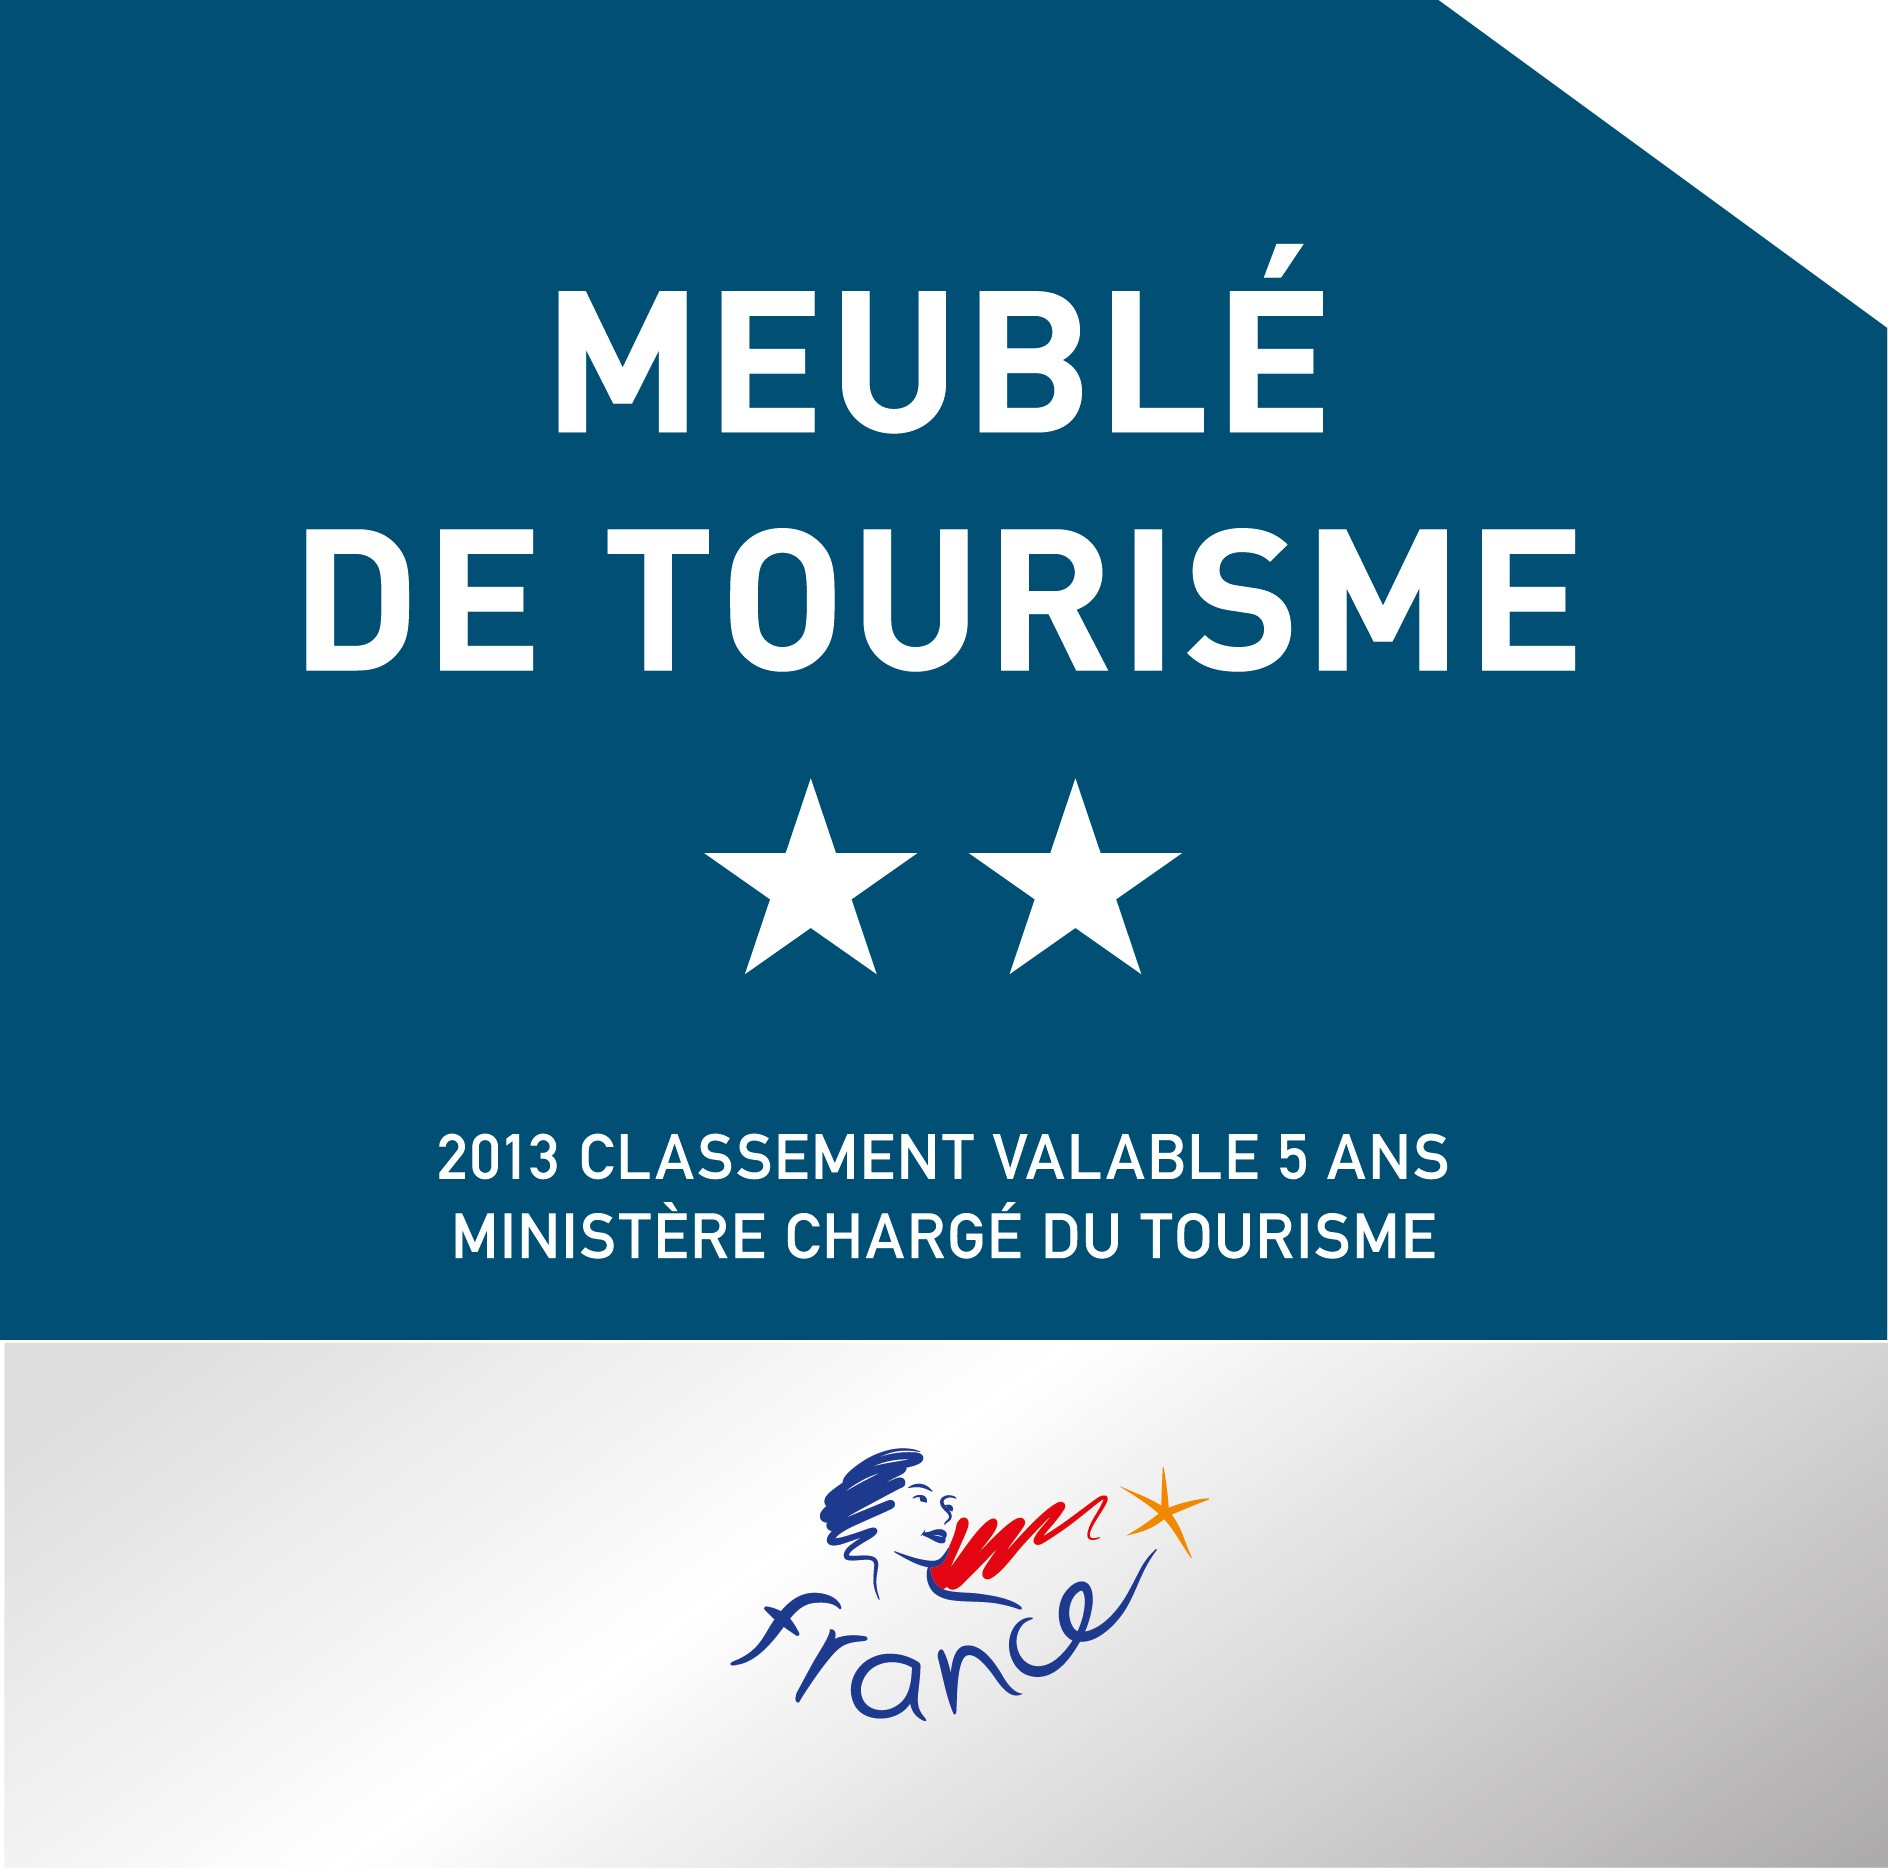 plaque-meuble-tourisme2-13-11627